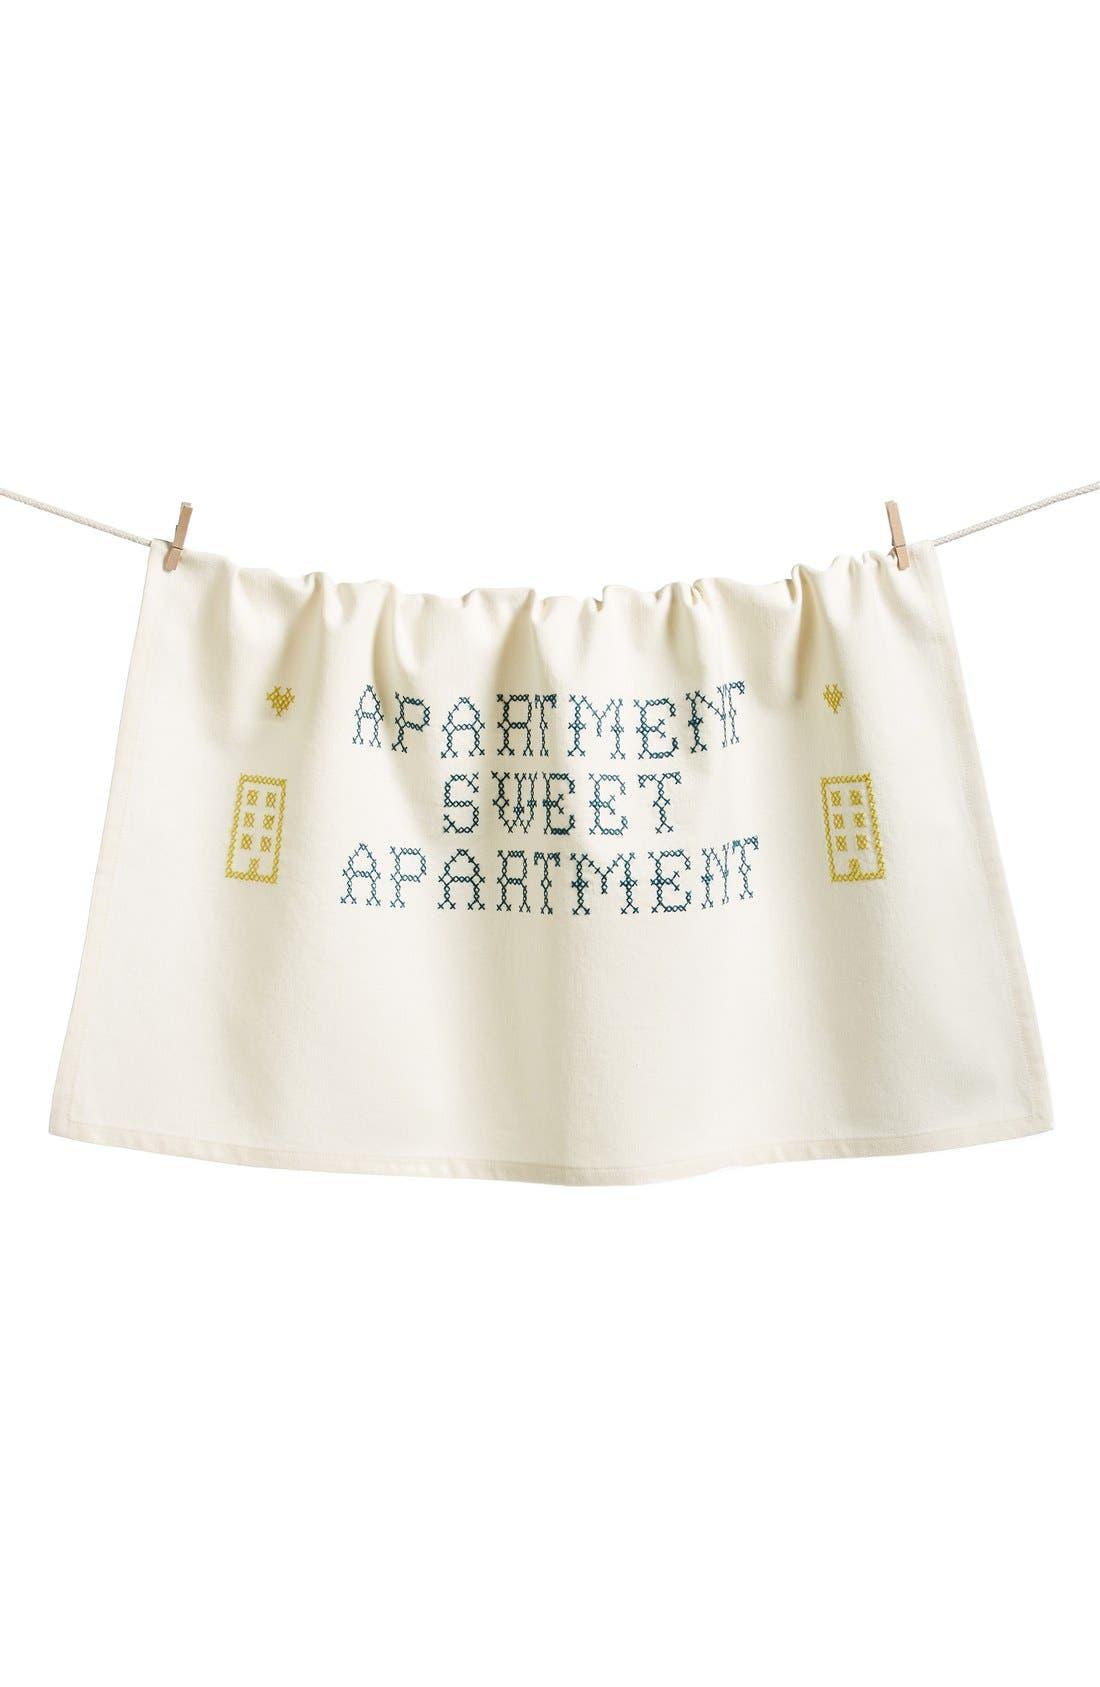 Main Image - Nordstrom at Home 'Sweet Apartment' Dish Towel